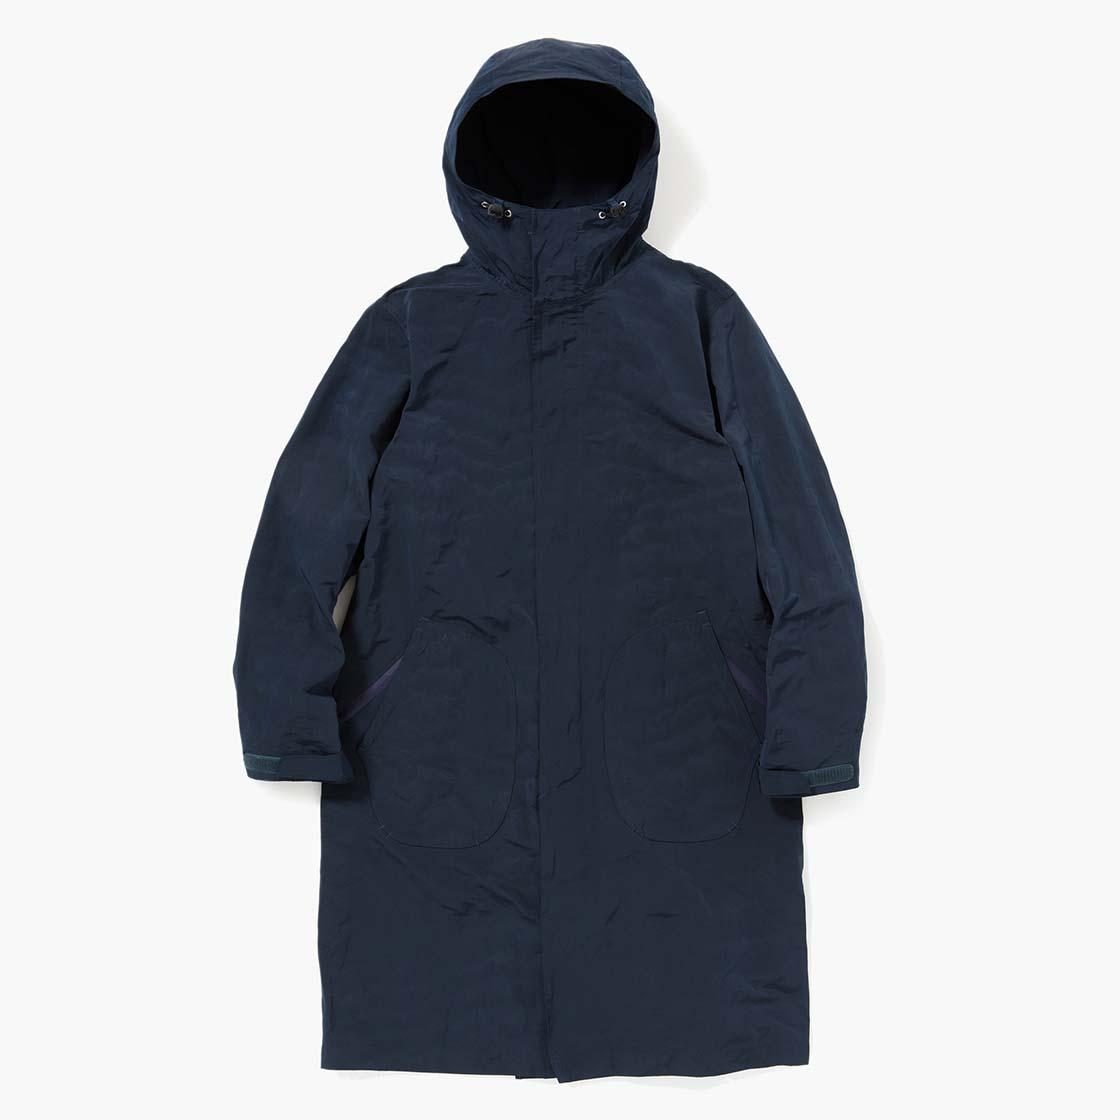 Ventile Sack Cover Rain Coat